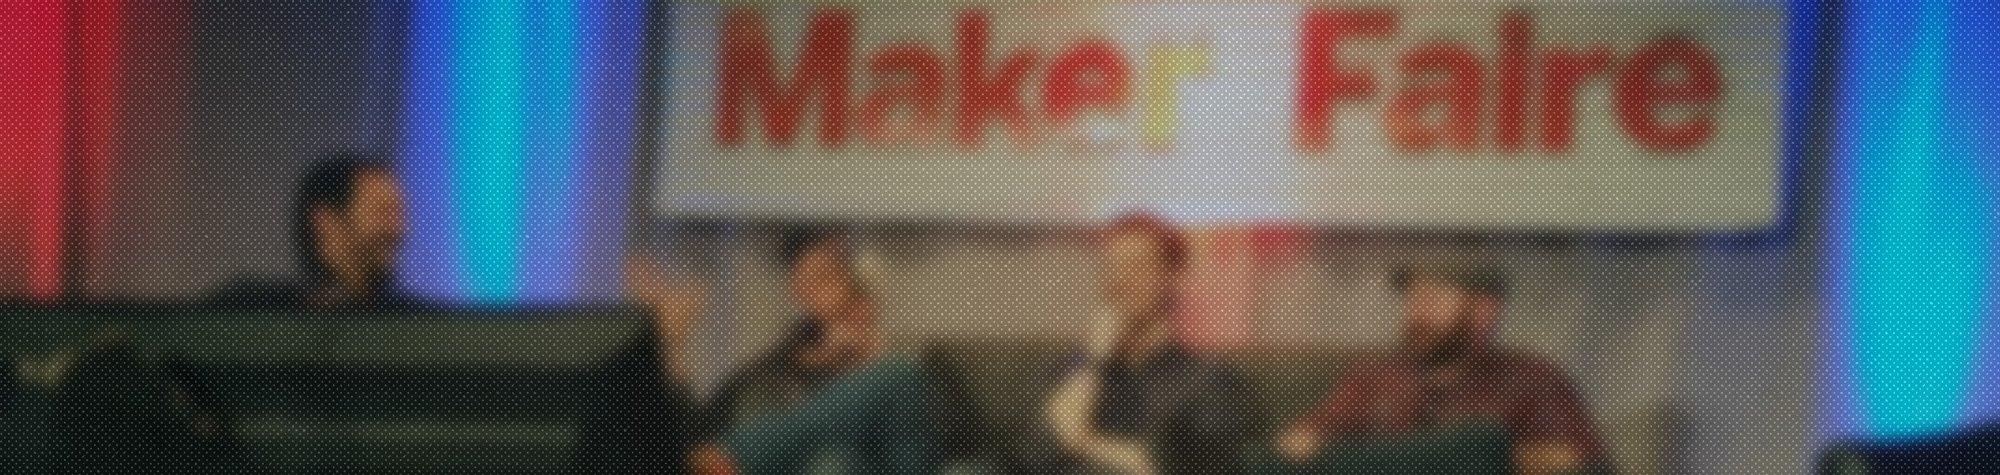 Maker Faire Bay Area 2017 Wrapup